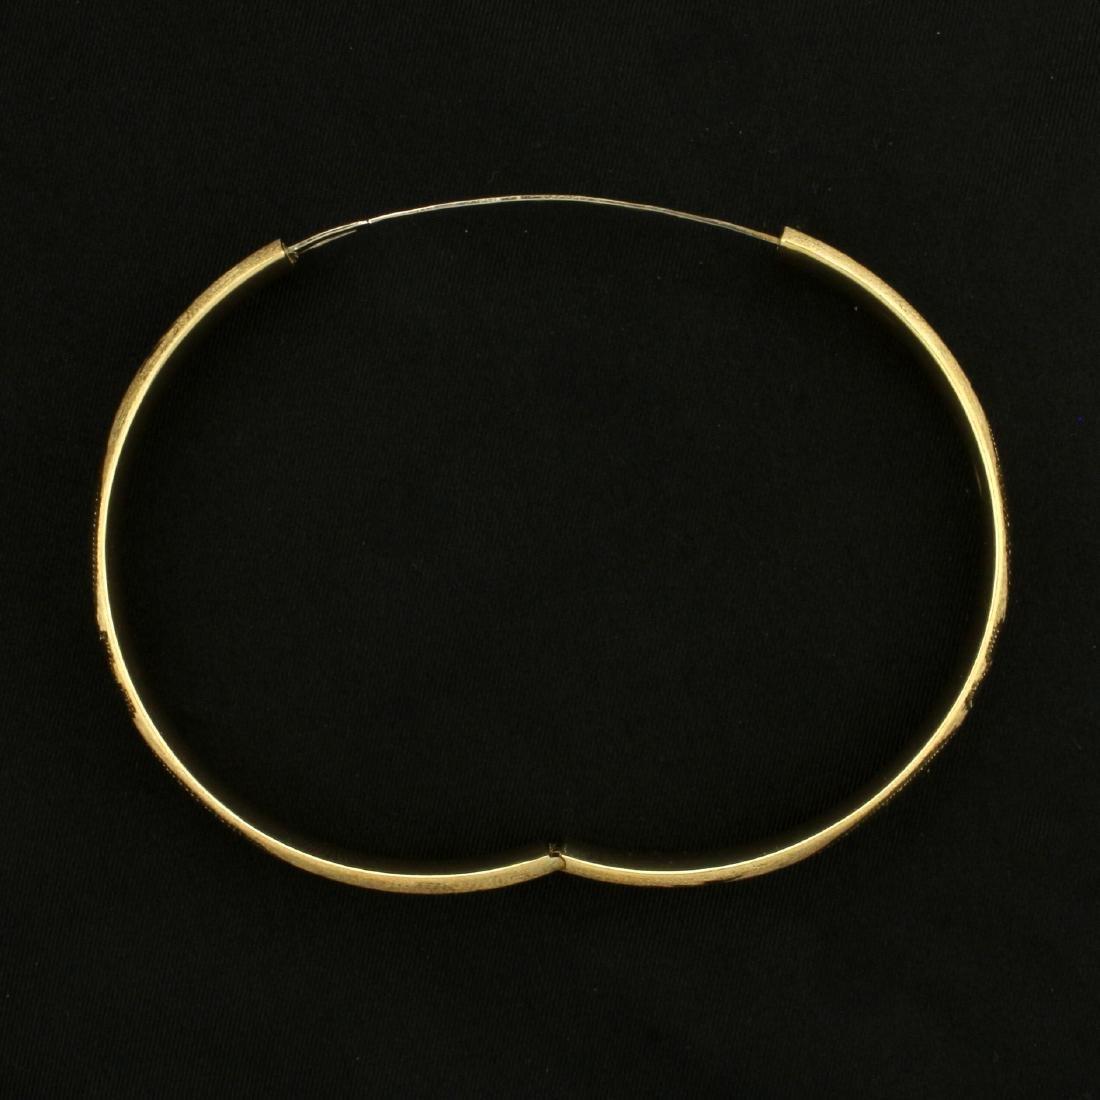 Diamond Cut Floral Design Bangle Bracelet in 14K Yellow - 4